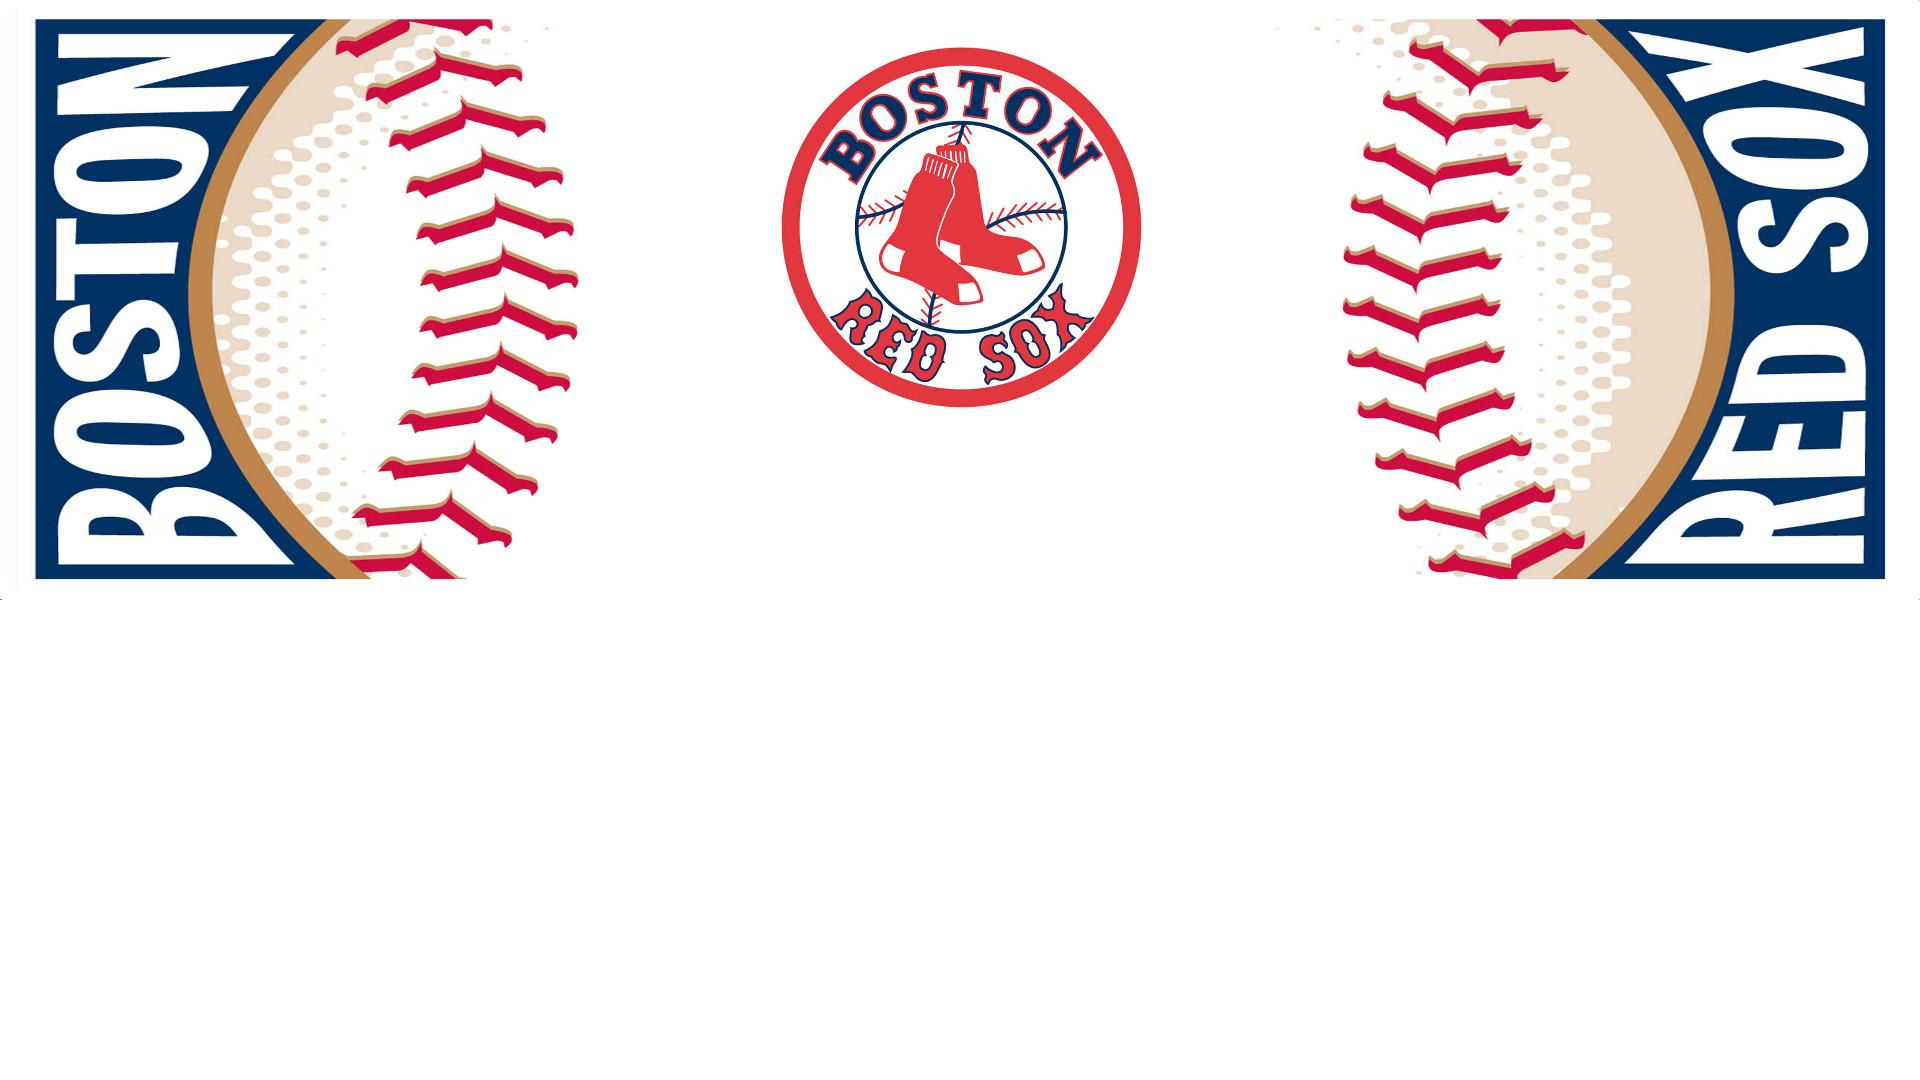 Boston Red Sox Logo Wallpaper 35437 HD Pictures | Top Wallpaper